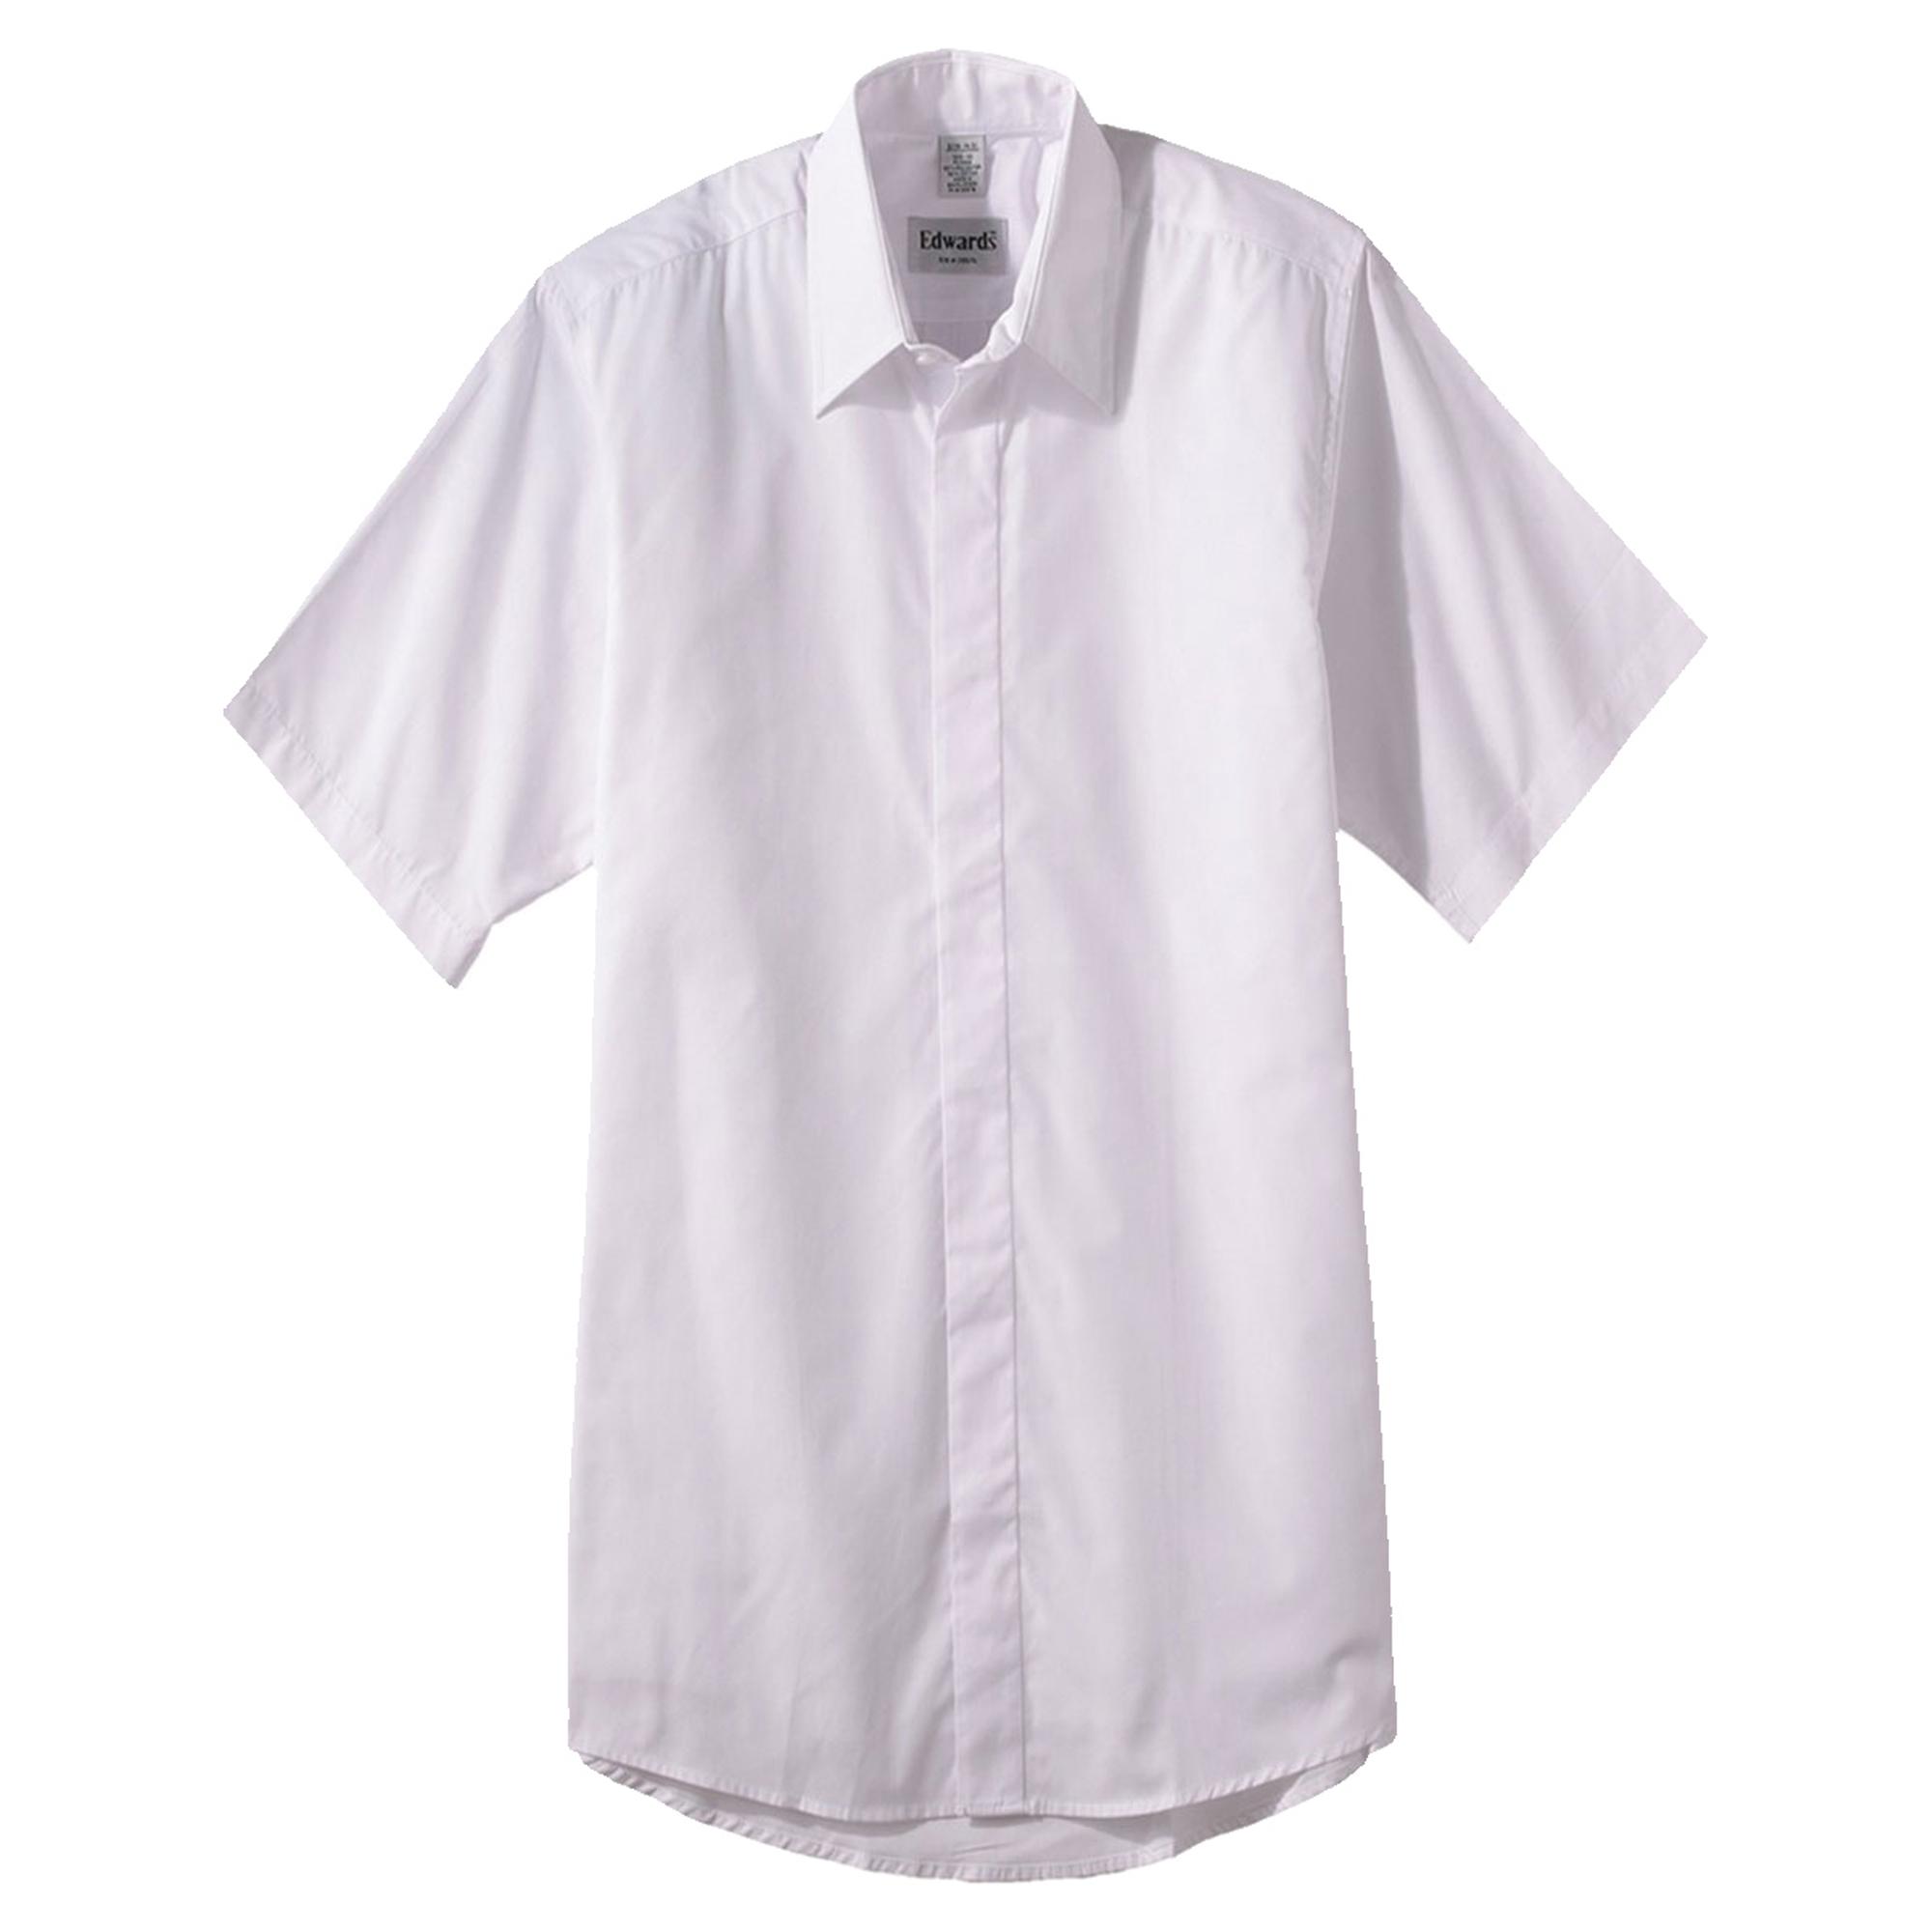 Edwards Garment Men's Café Button Down Collar Shirt